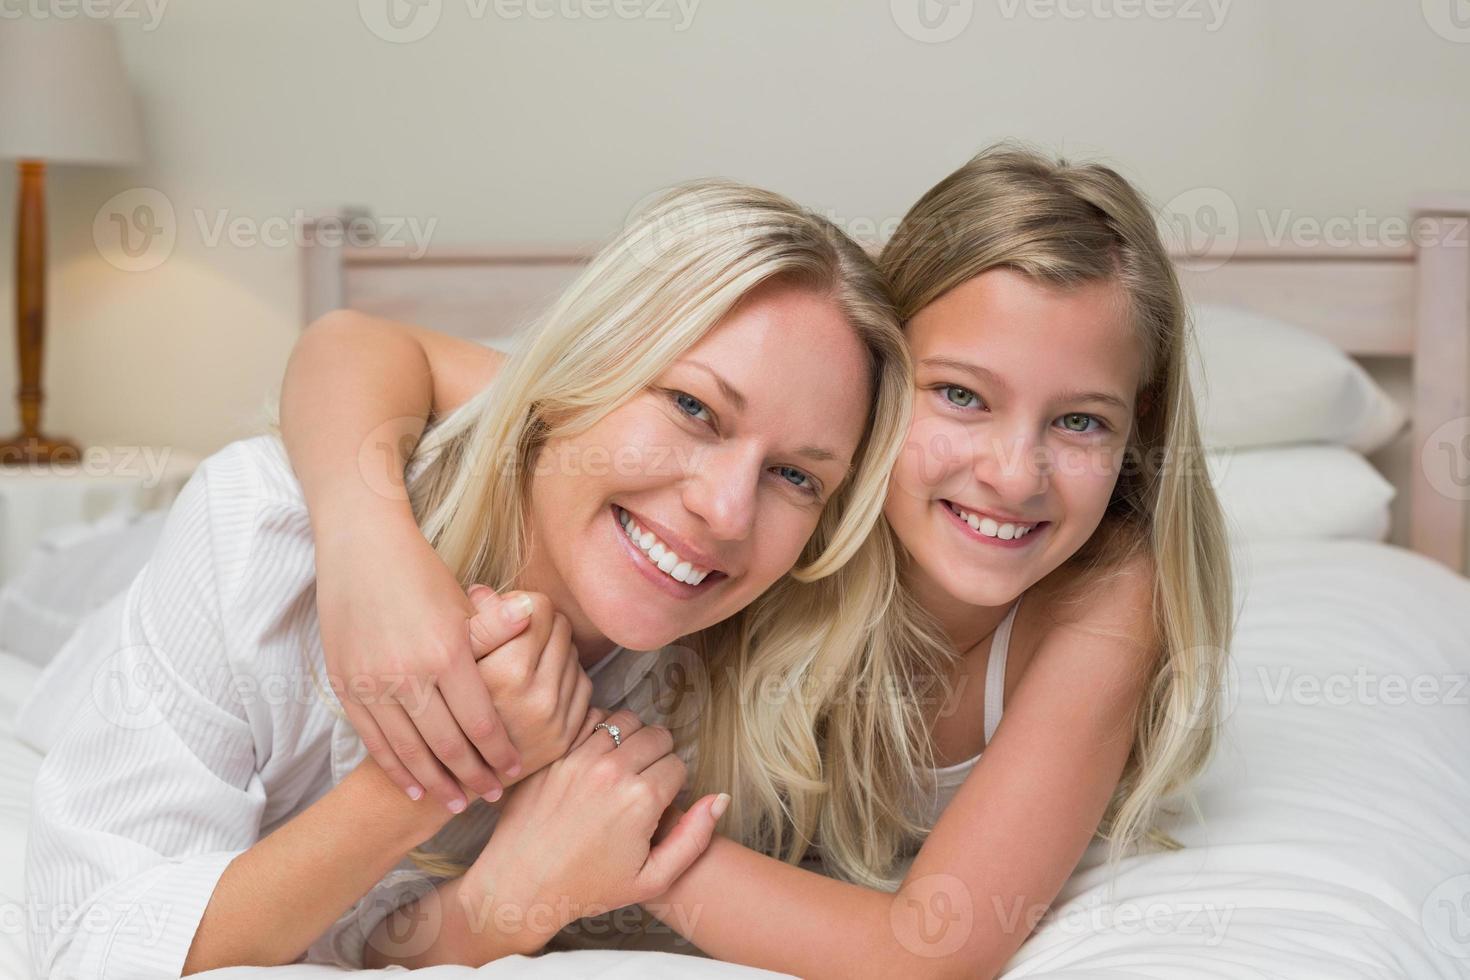 liefdevolle moeder en dochter in bed liggen foto